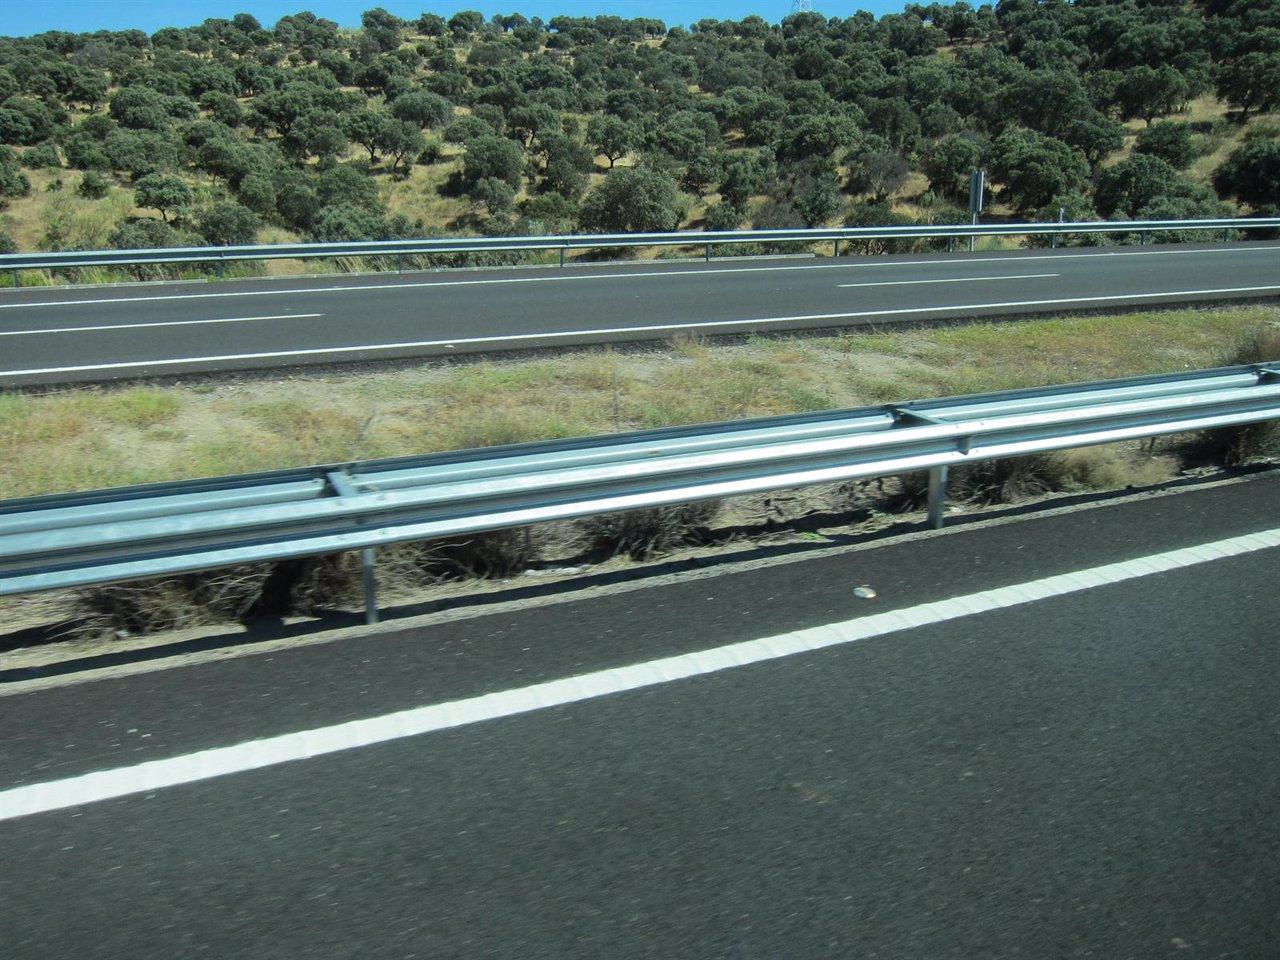 Carretera, Autopista, Autovía Vacía